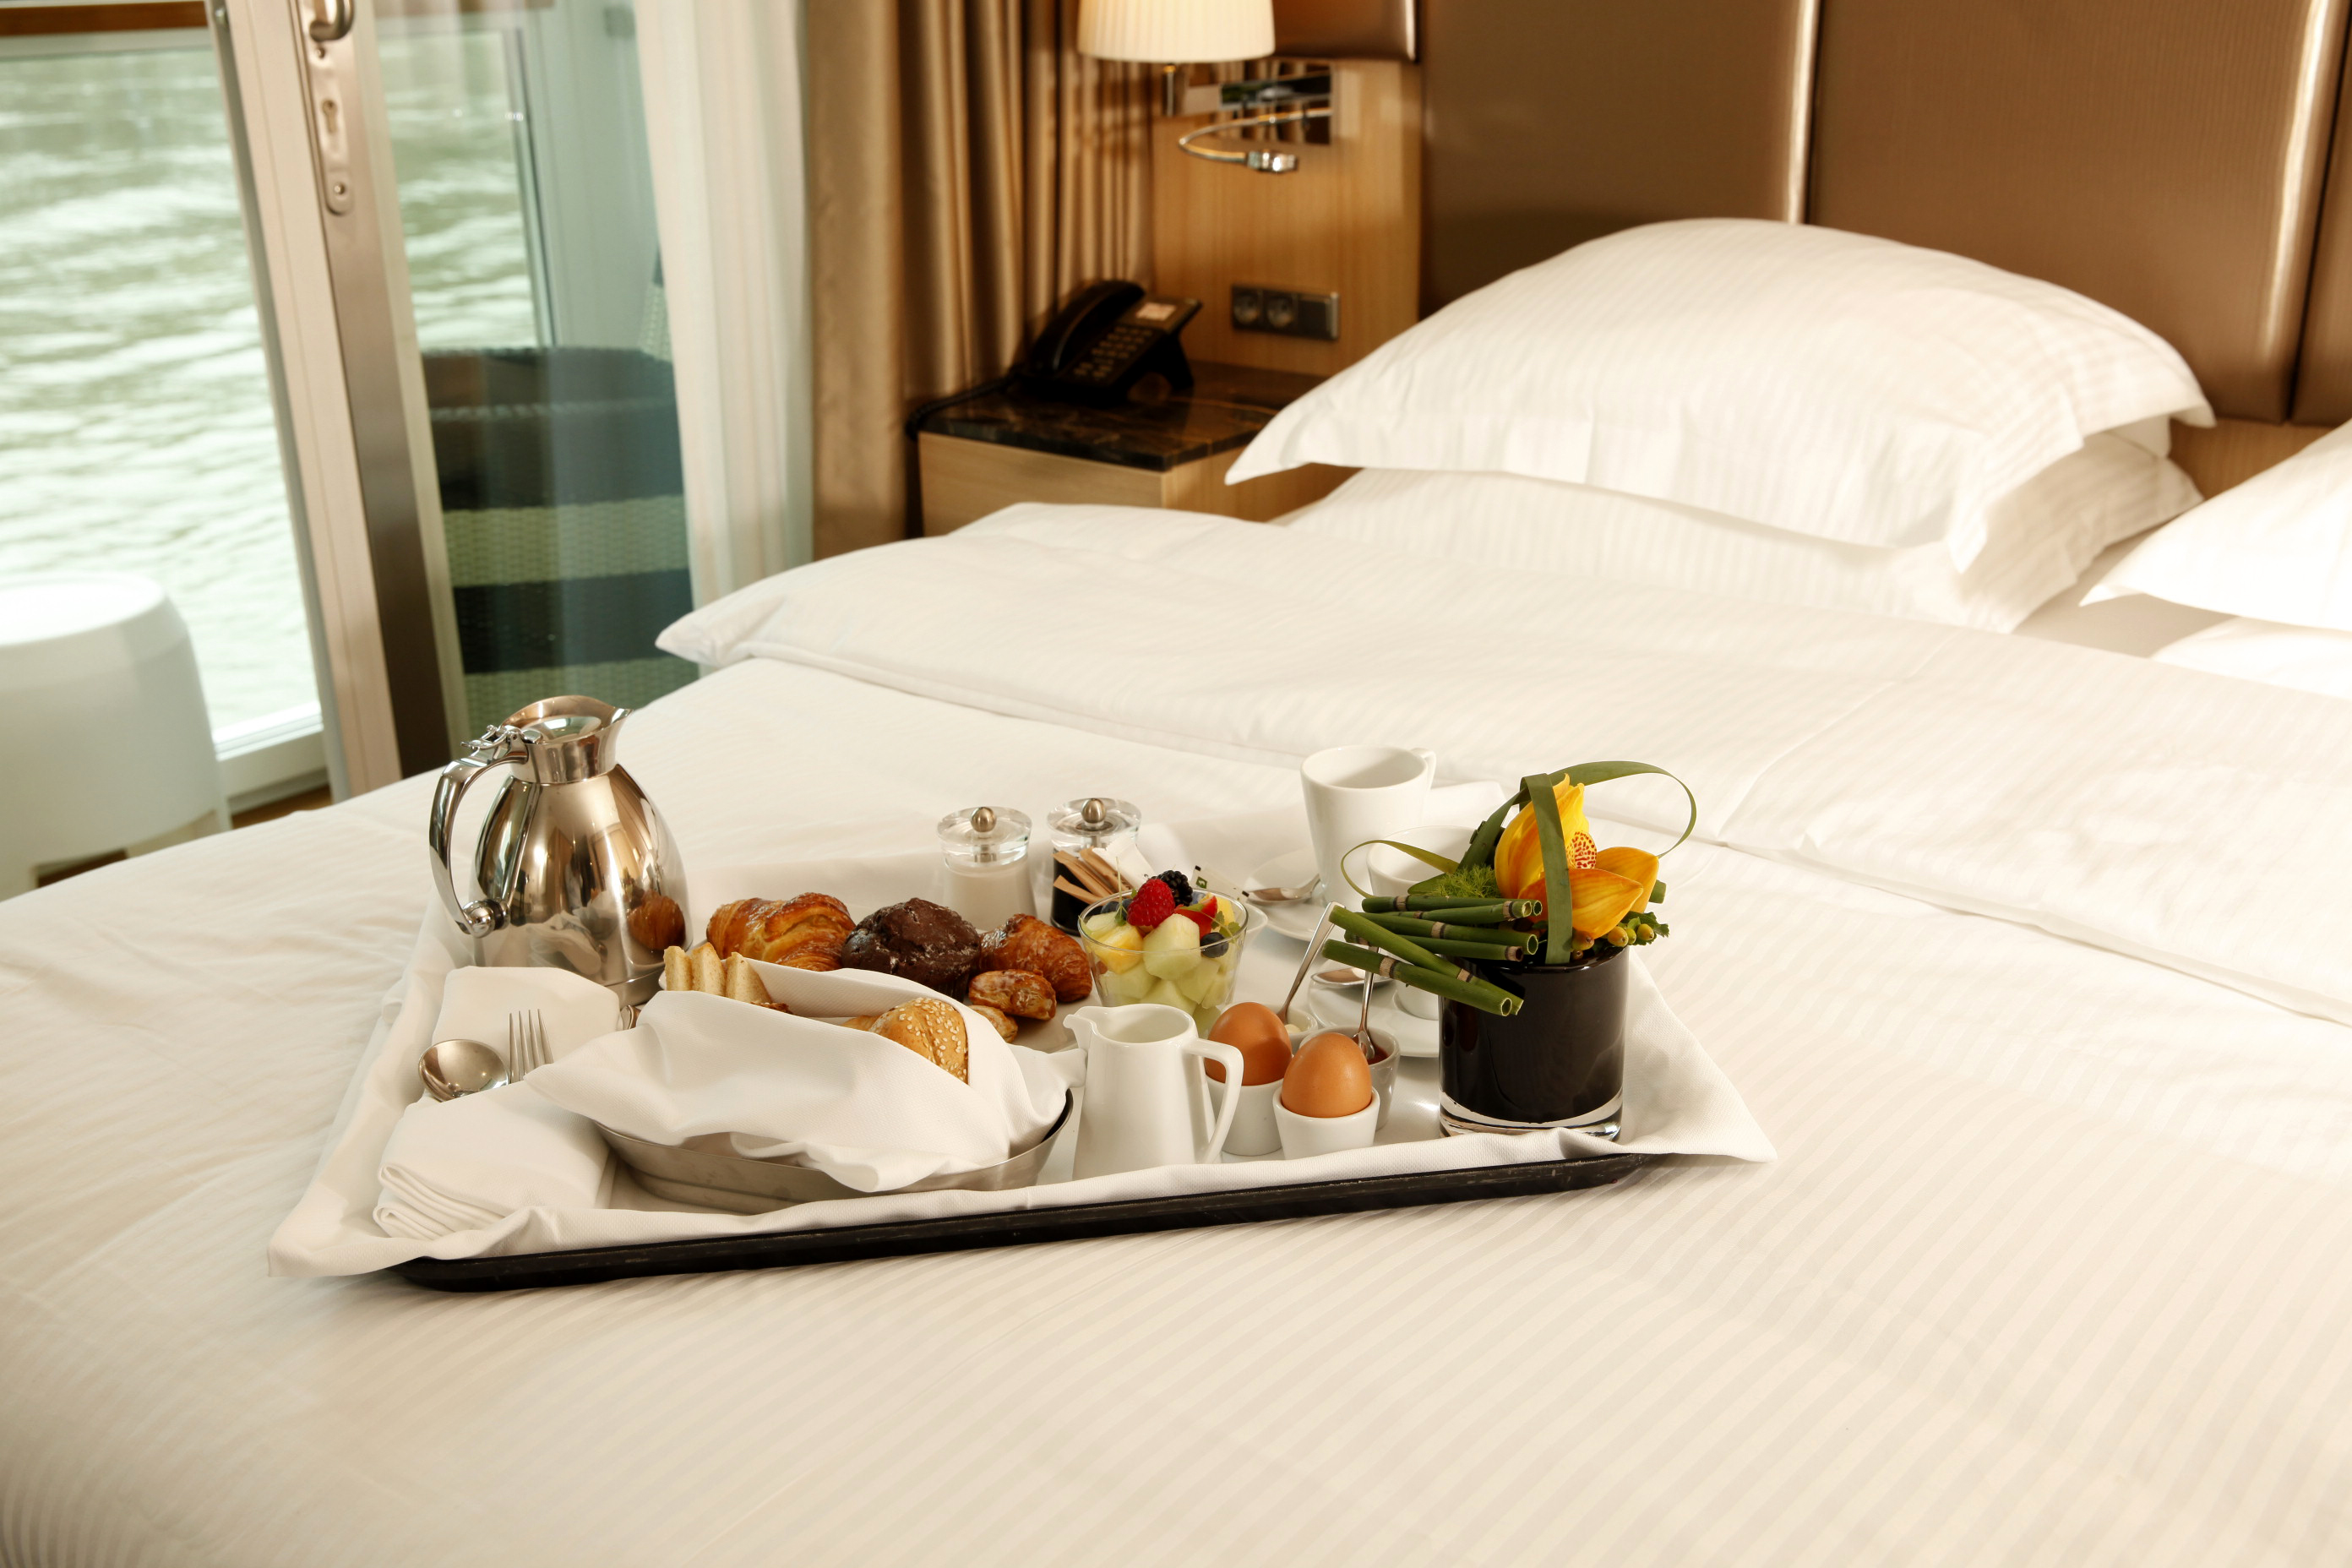 Scenic Jasper Room Service Dining _MG_9724.jpg